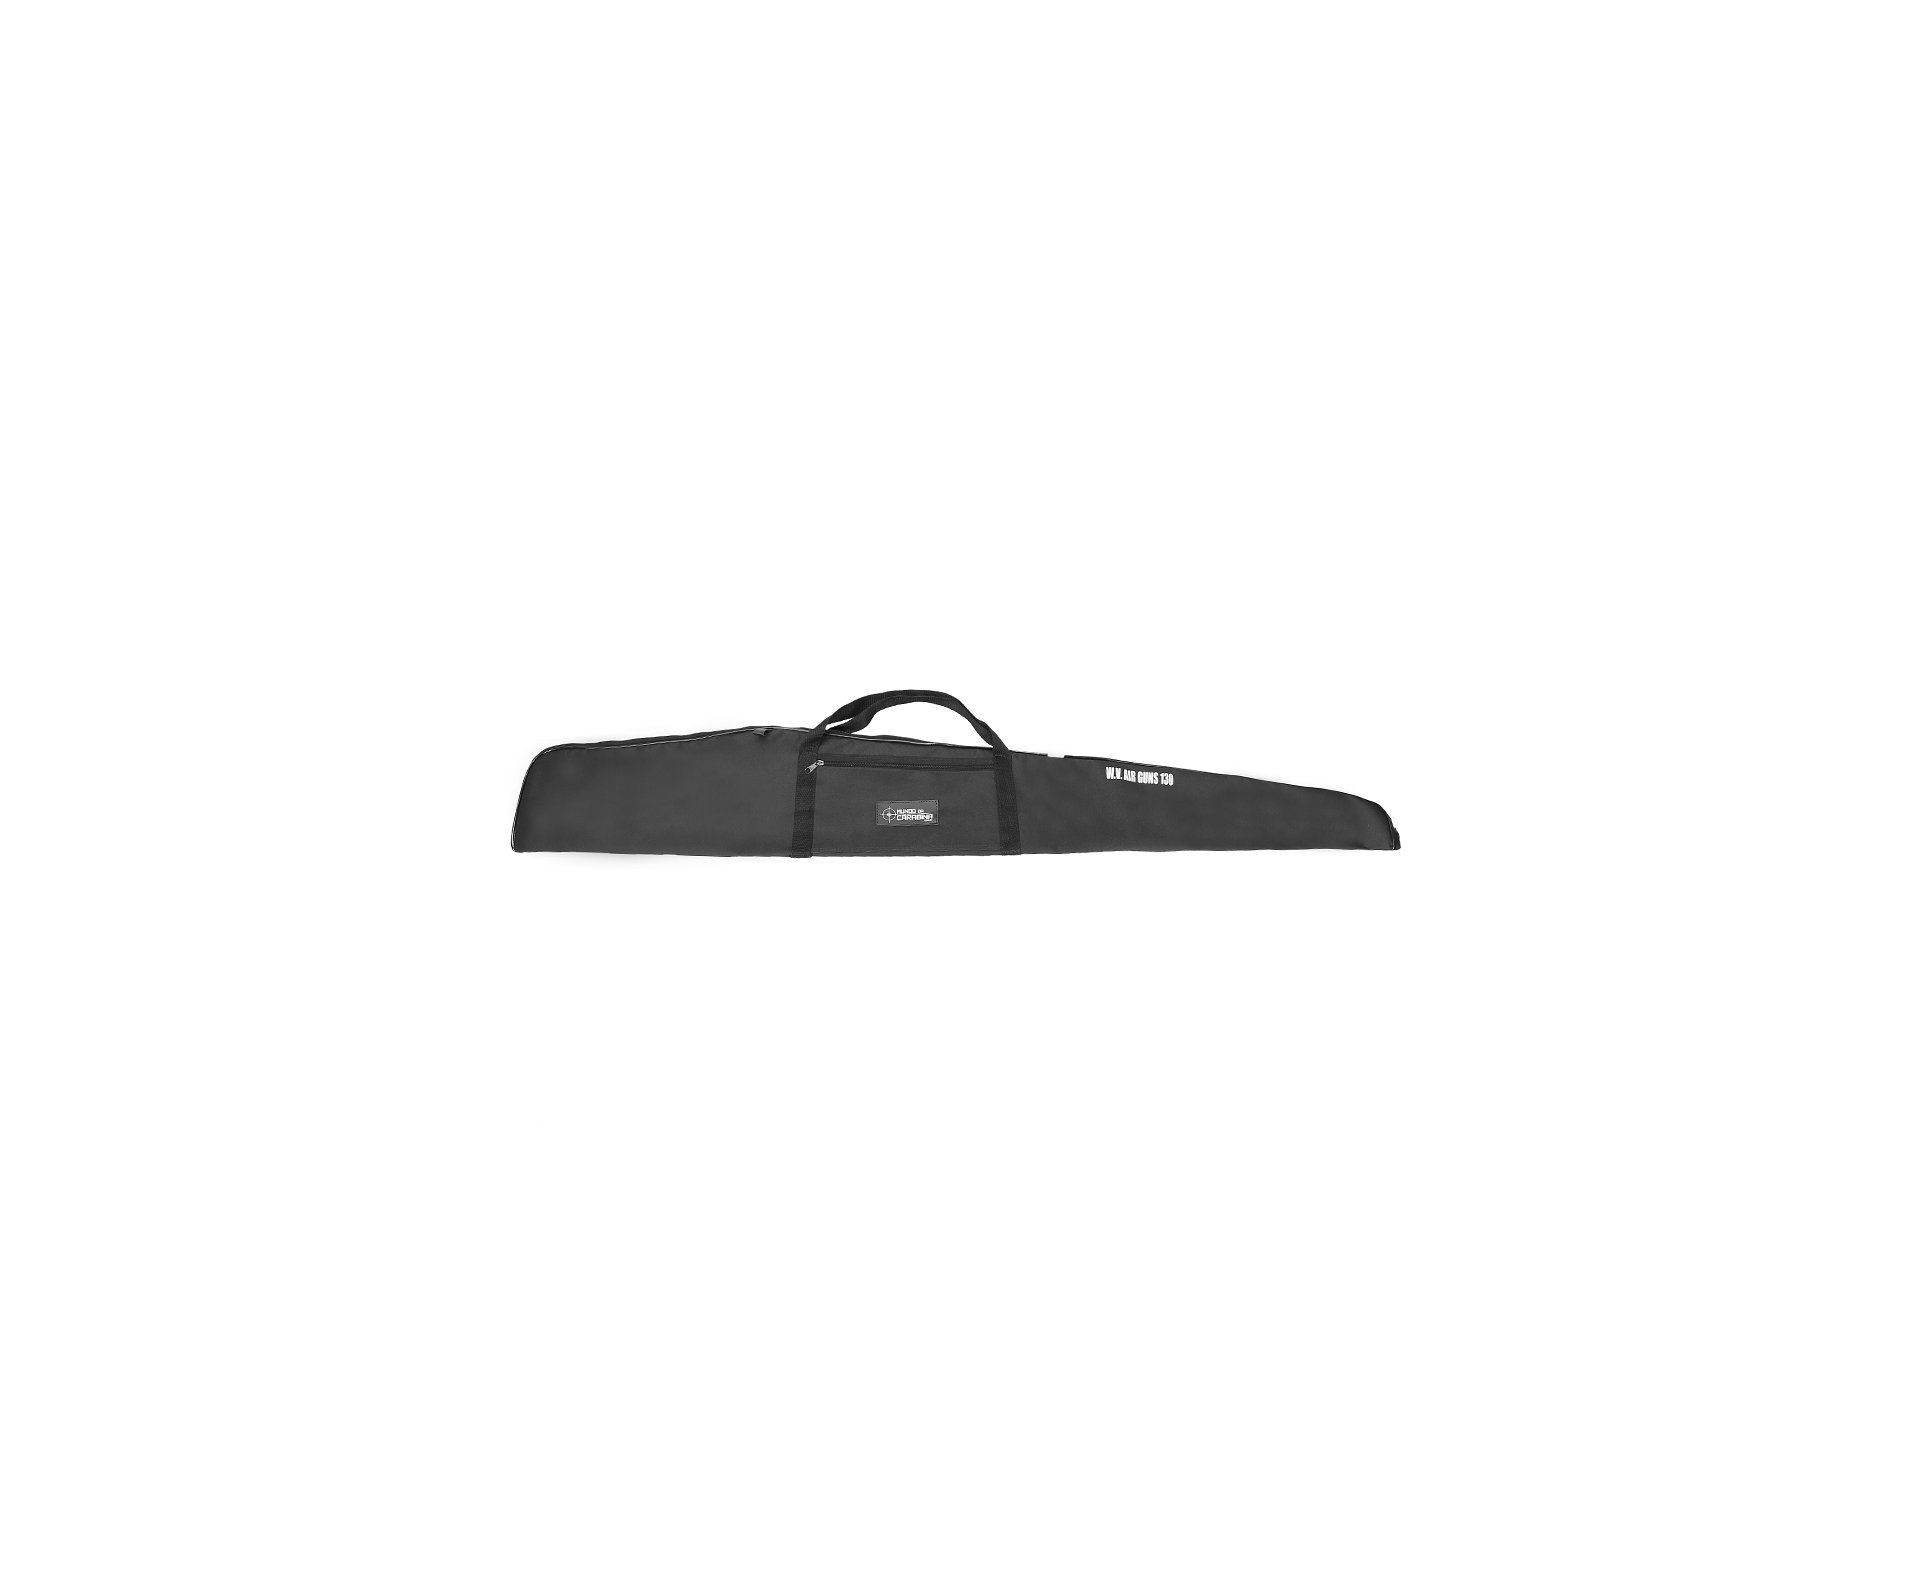 Carabina De Pressão Everest Black 4,5mm Gás Ram 60kg Qgk By Spa + Luneta 4x32 + Capa